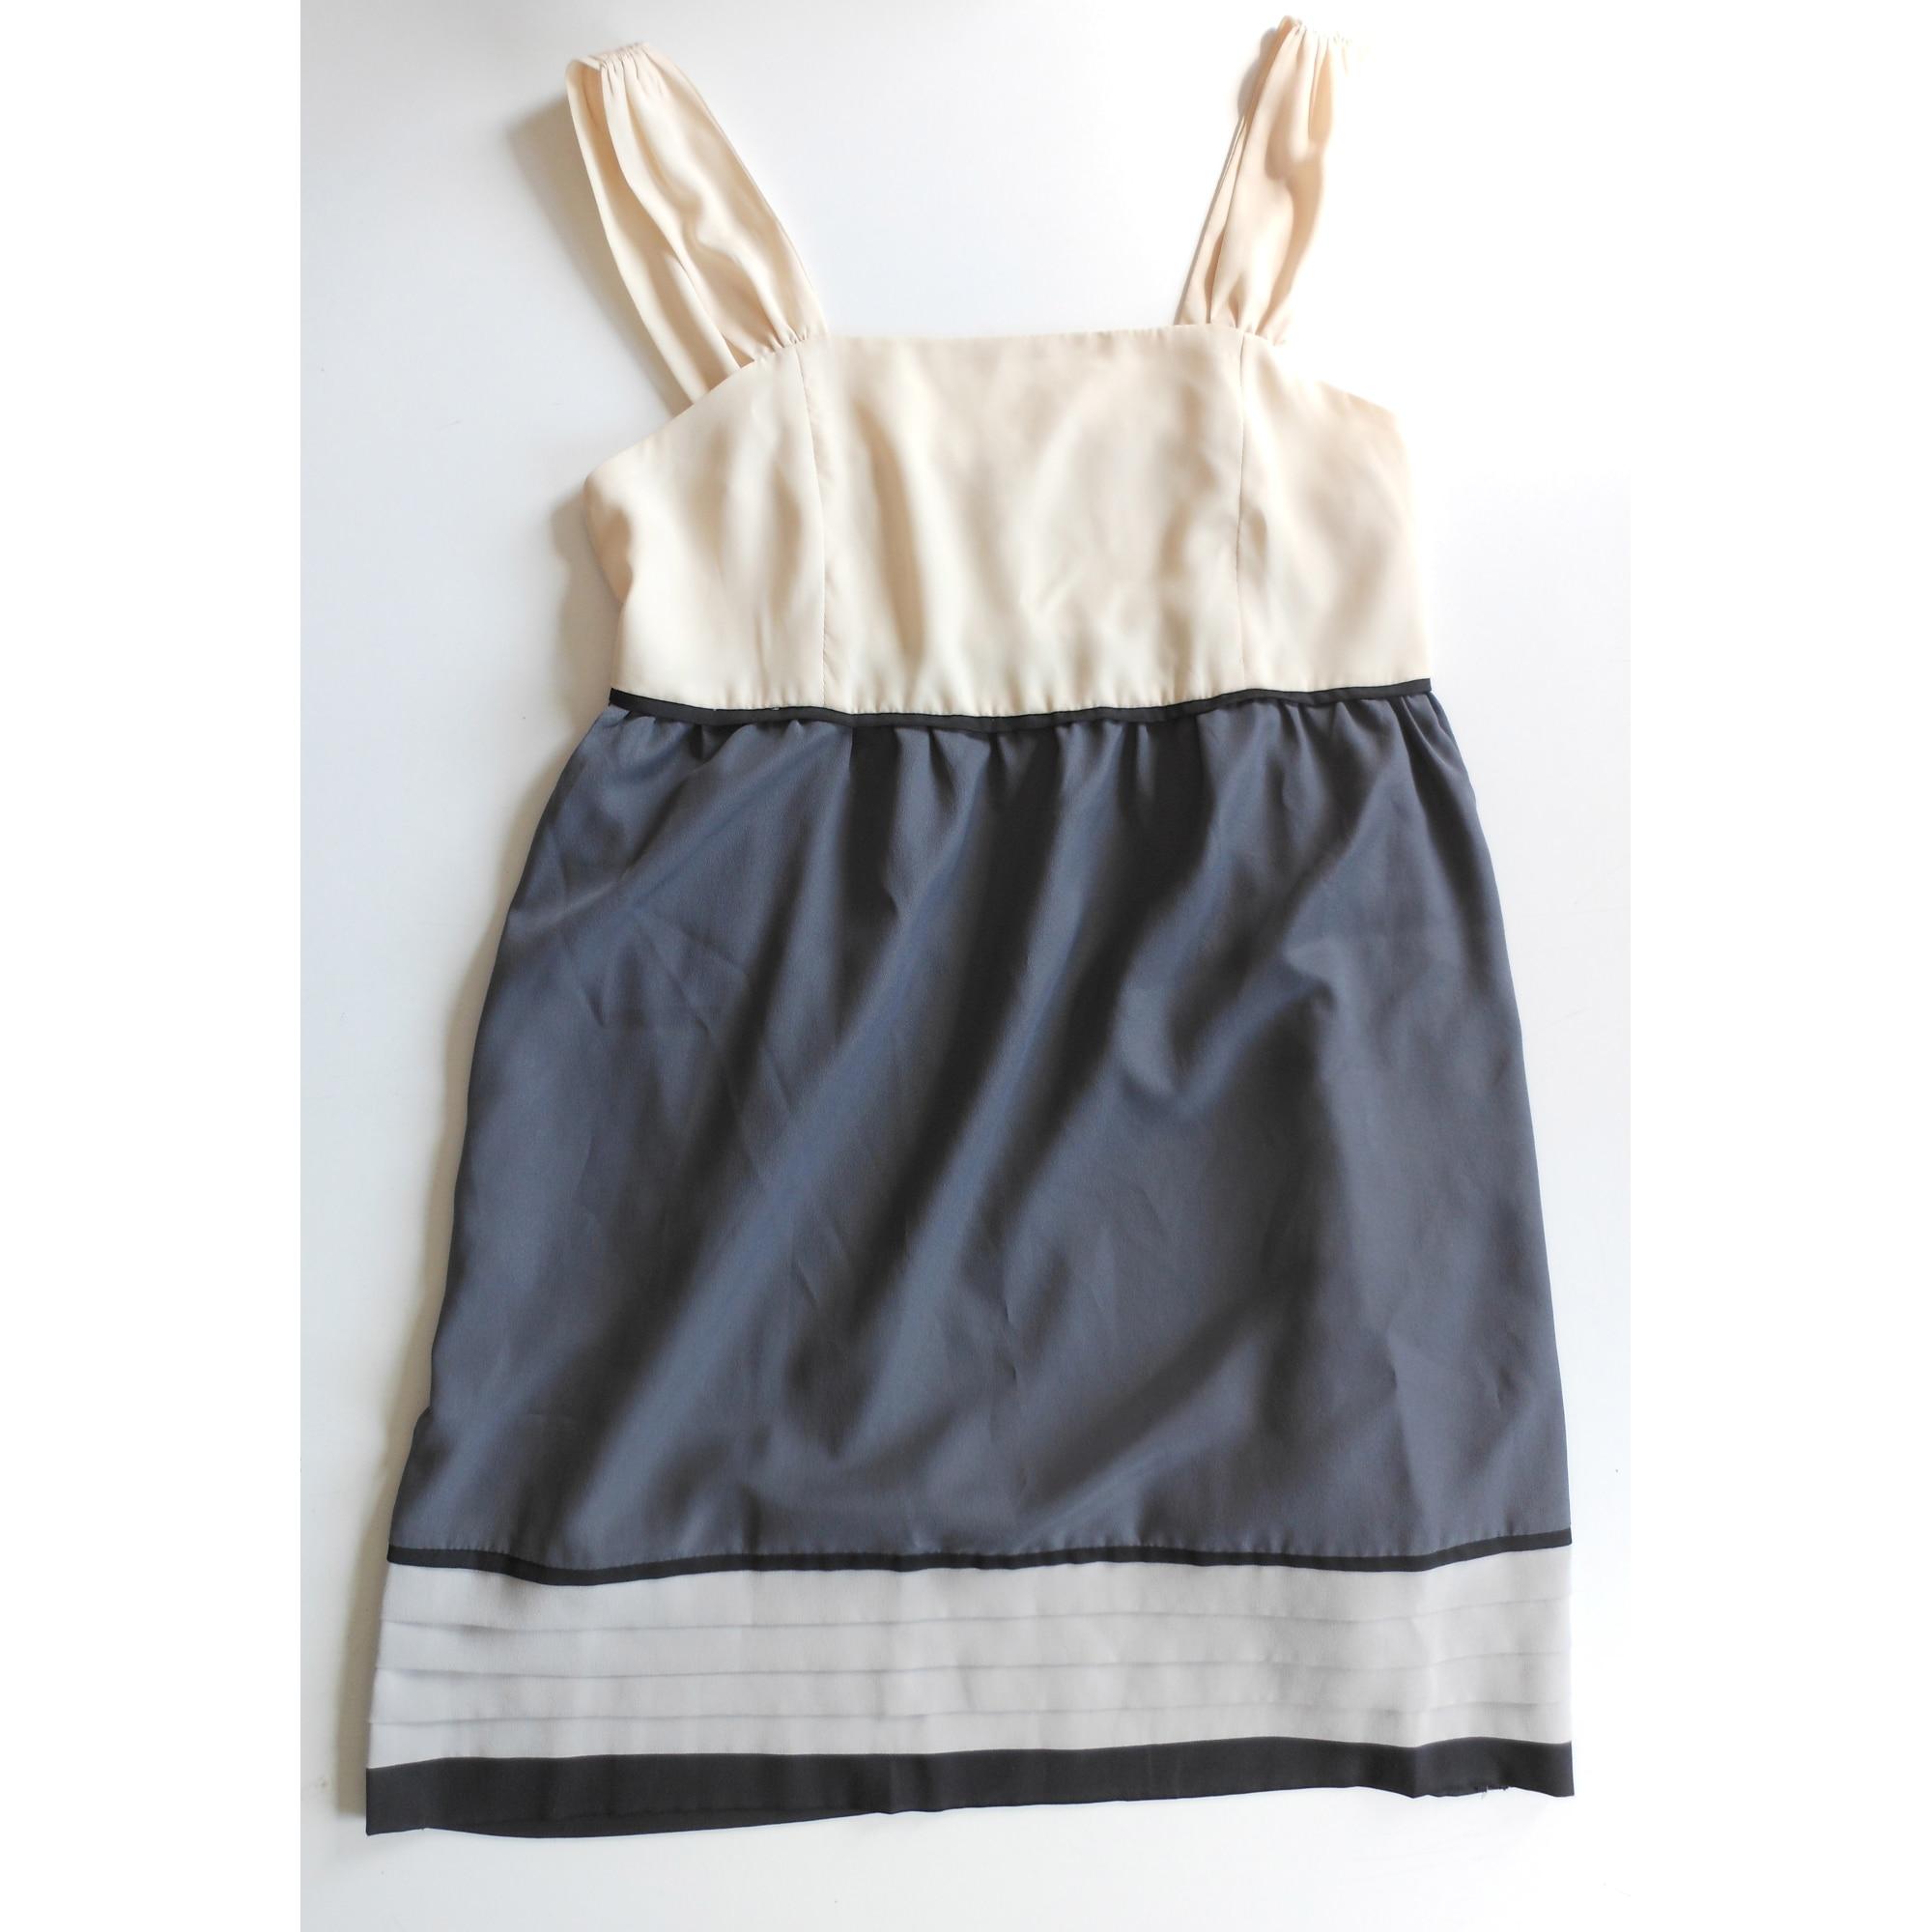 Robe courte KLING Gris, anthracite